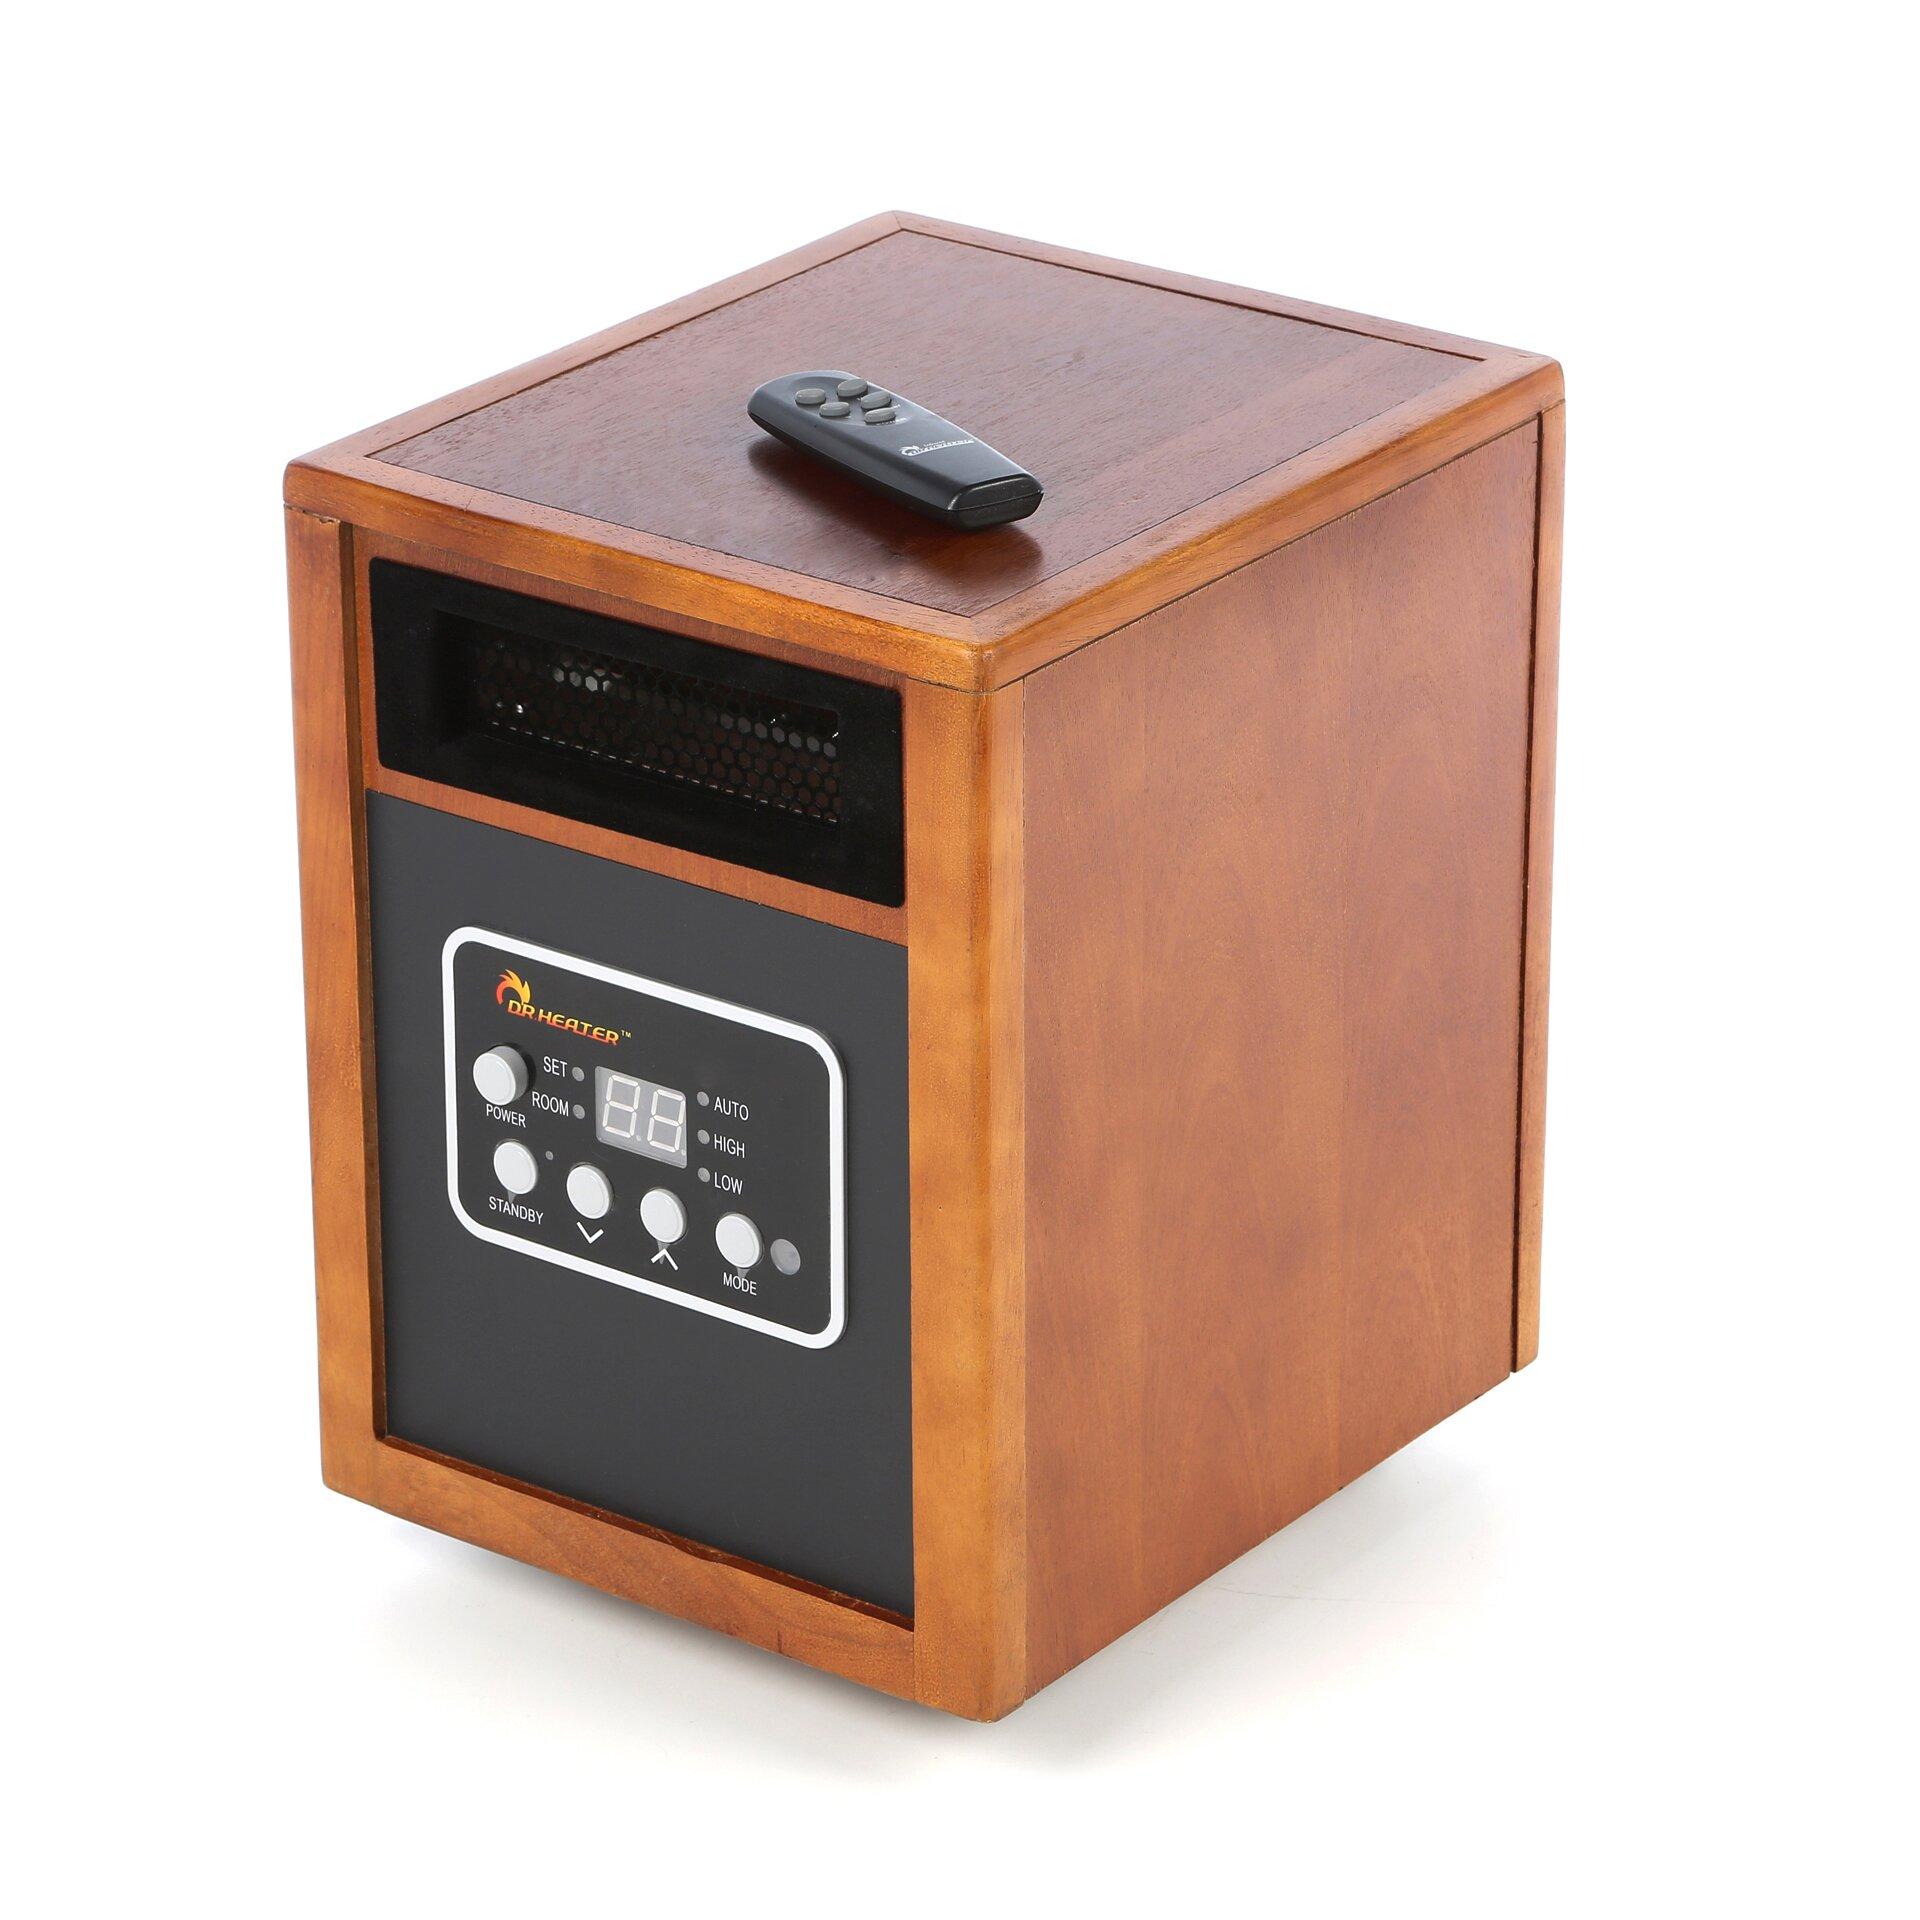 Infrared Heater 1,500 Watt Portable Electric Infrared Cabinet Heater